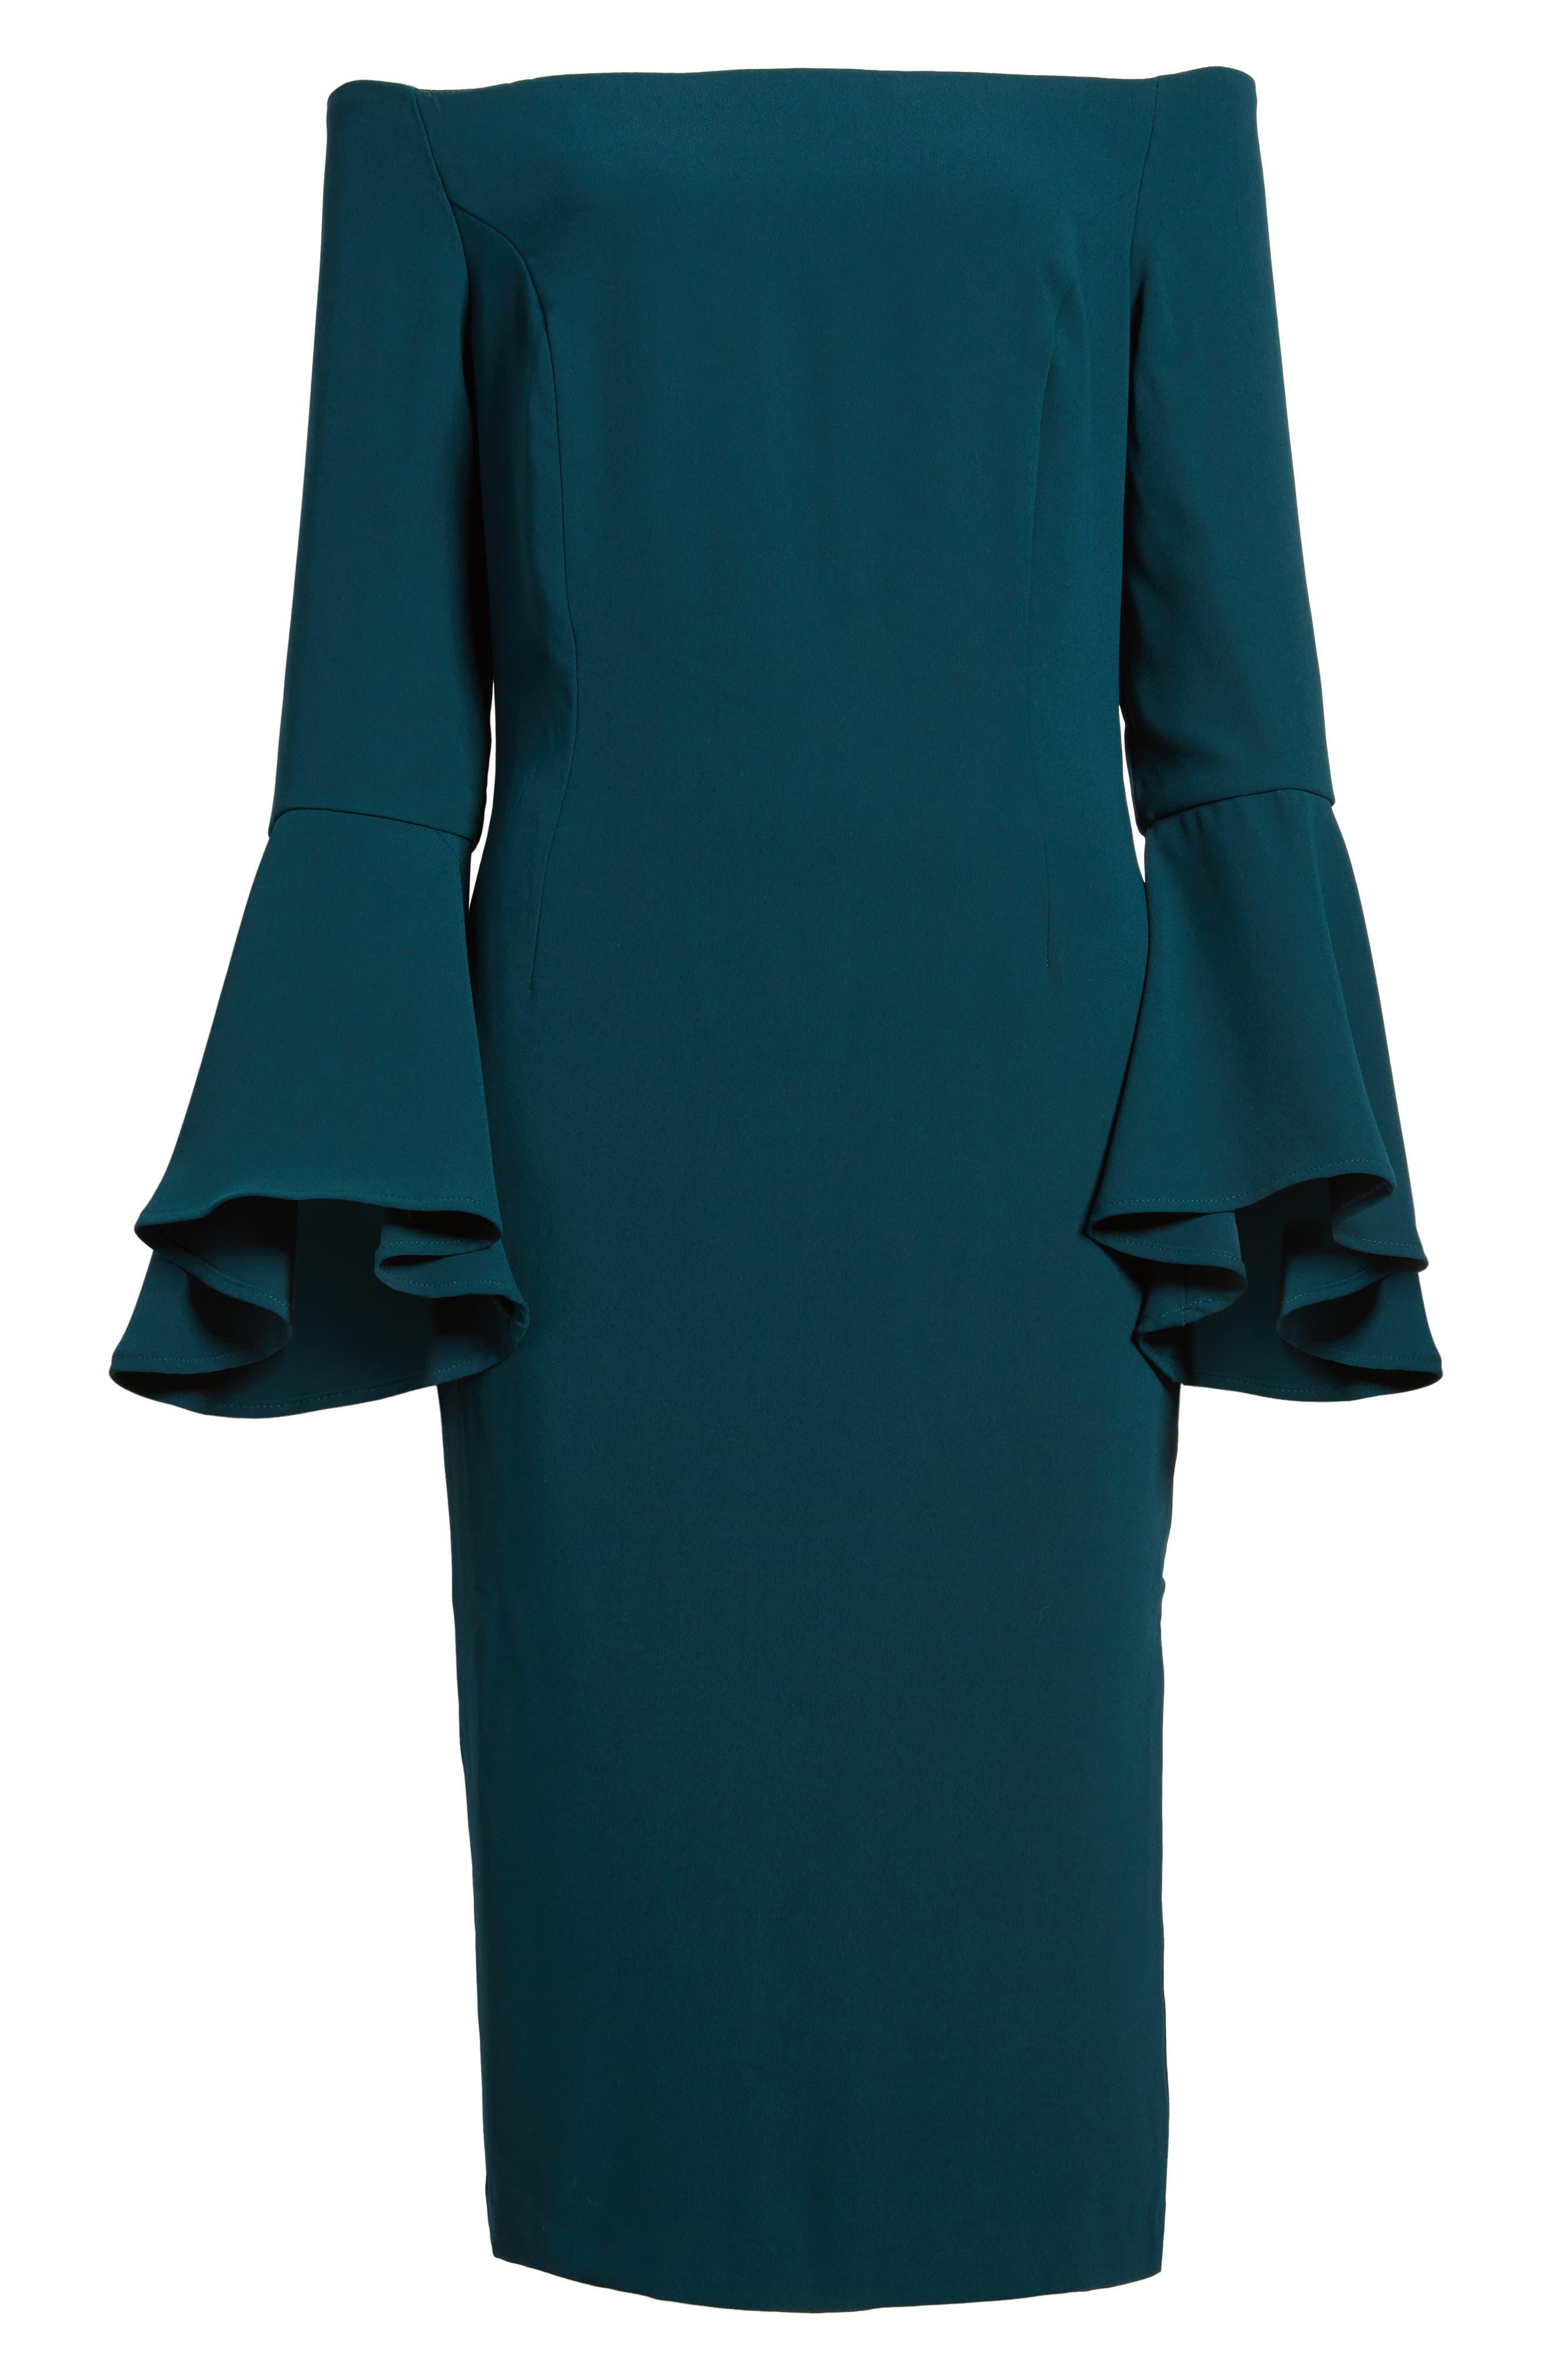 'Solange' Off the Shoulder Midi Dress,                             Alternate thumbnail 7, color,